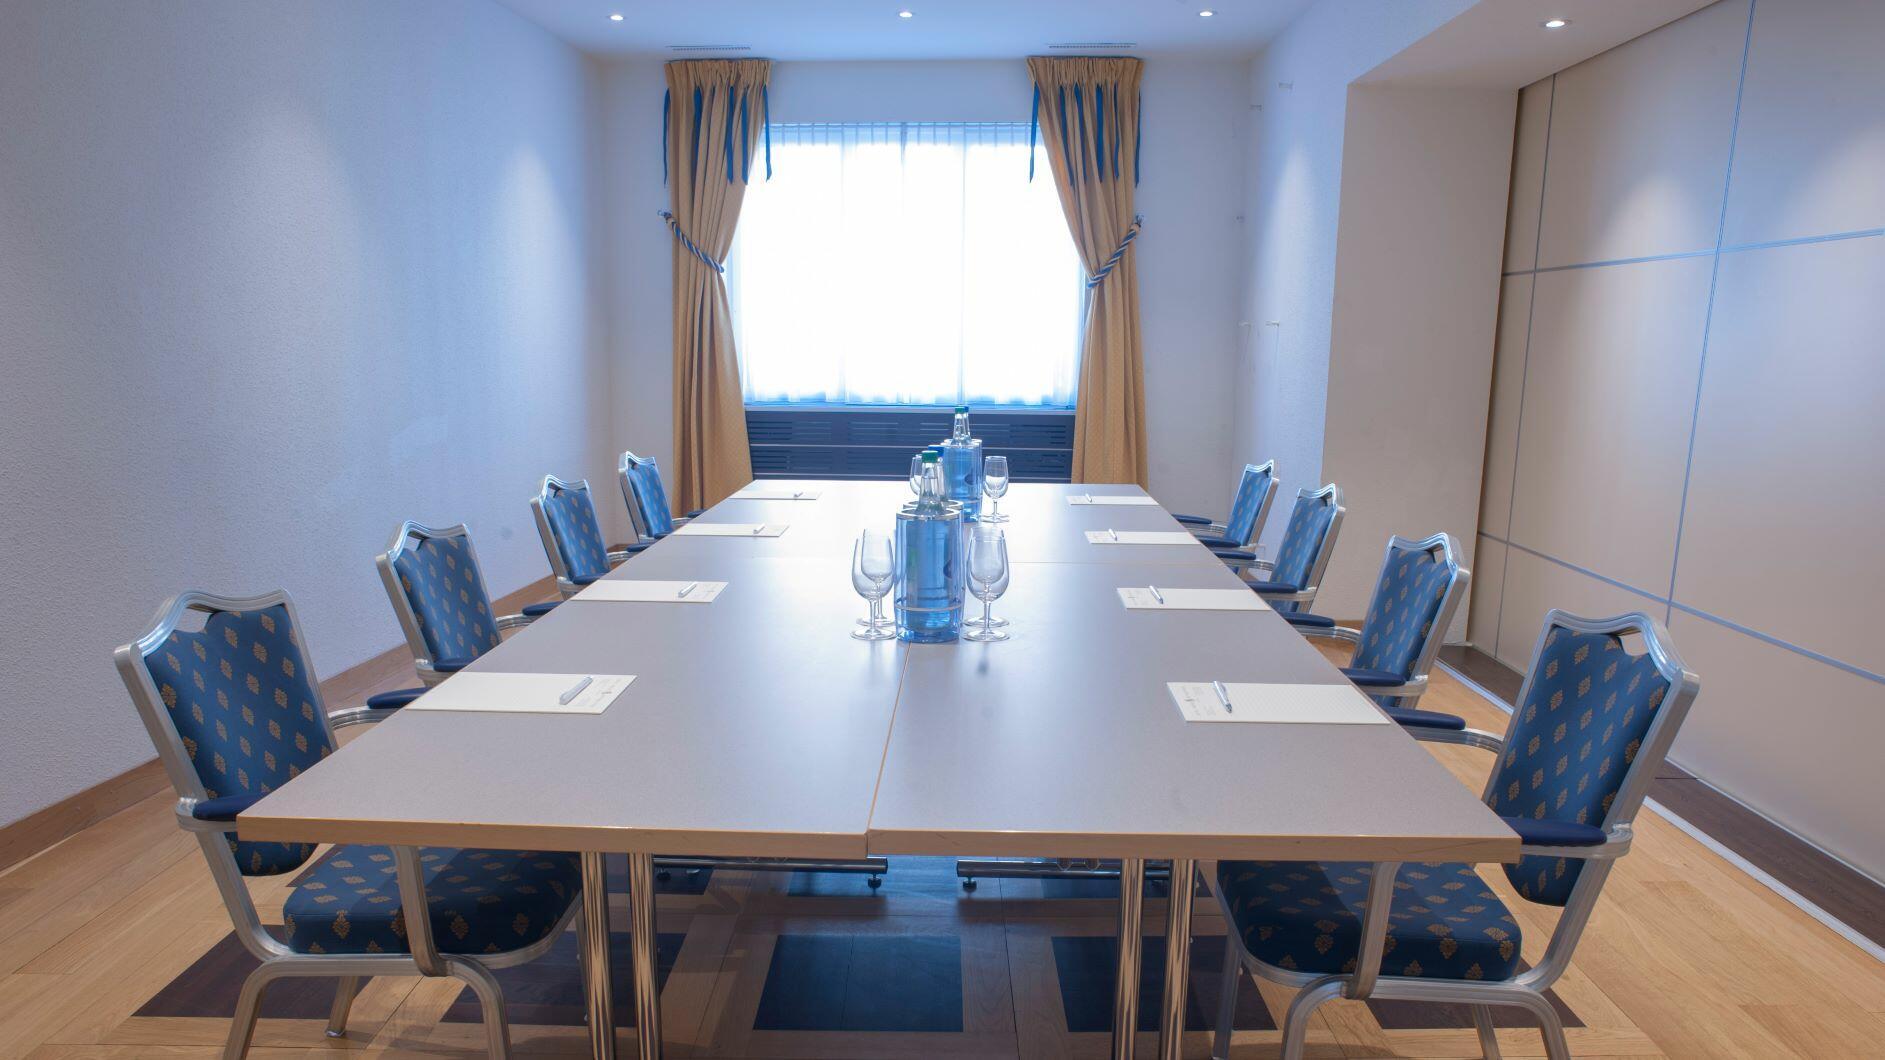 Meetings & Events at Hotel Krone Unterstrass in Zurich